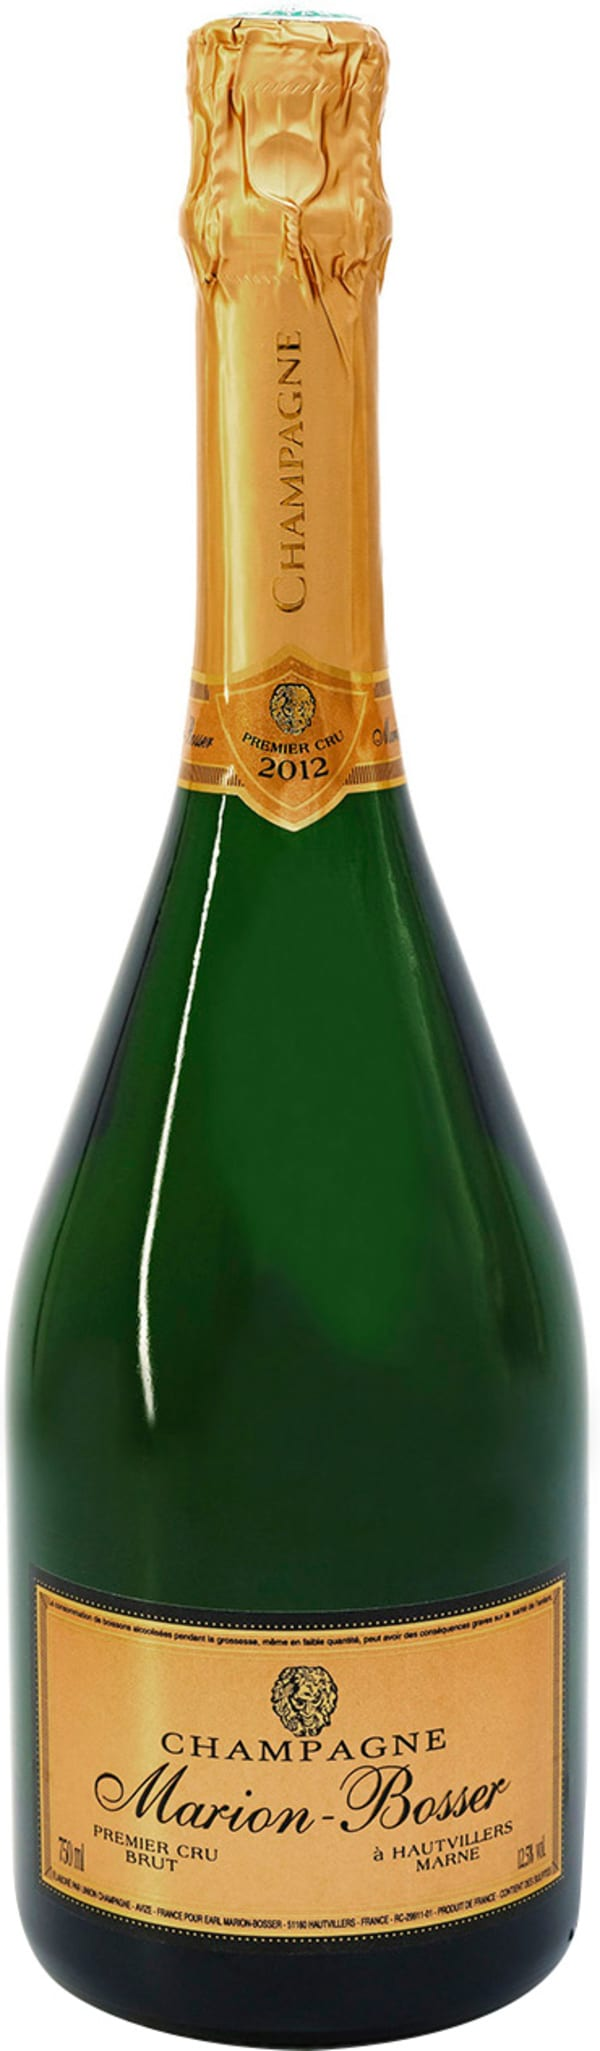 Marion-Bosser Premier Cru Champagne Brut 2012